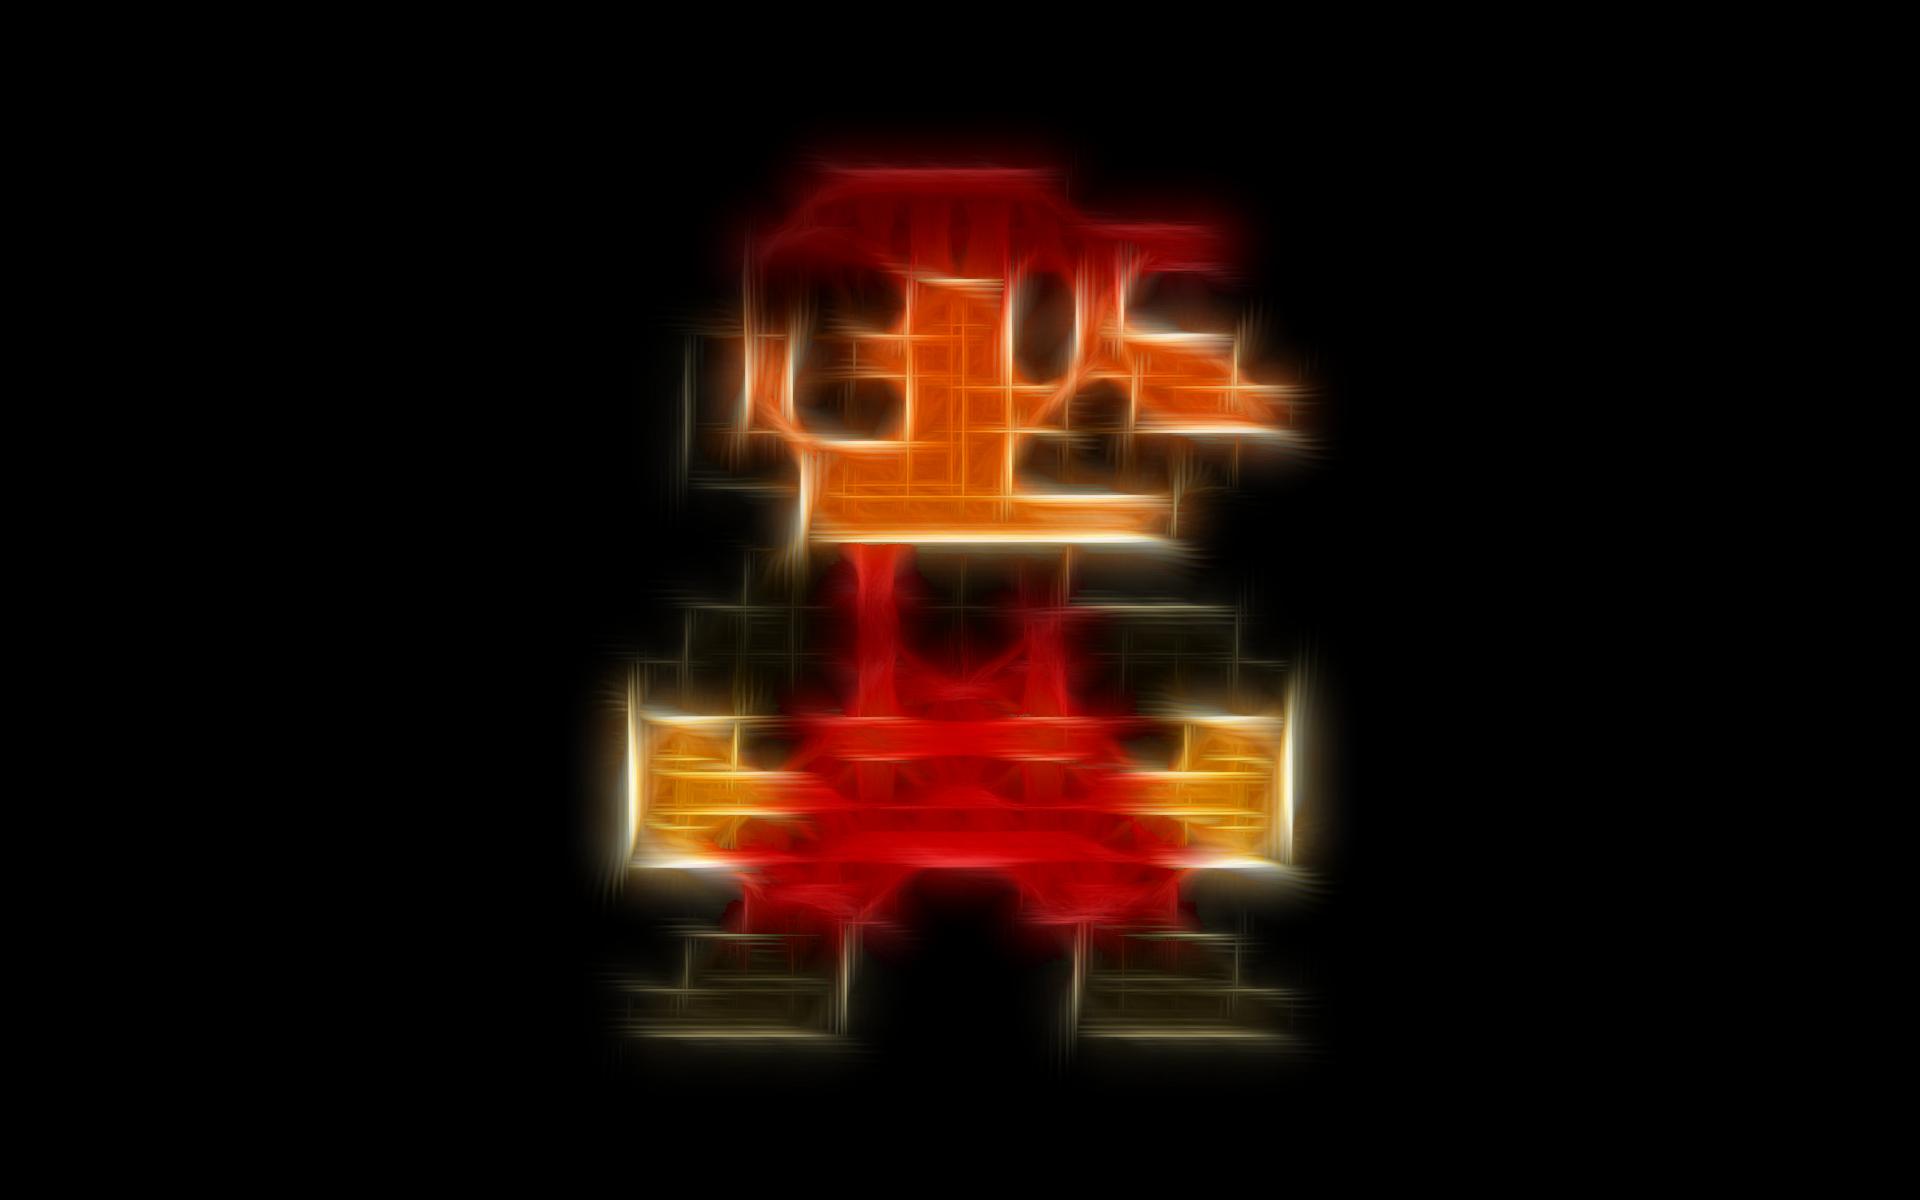 TechCredo retro 8 bit pixelart wallpapers 101 1920x1200